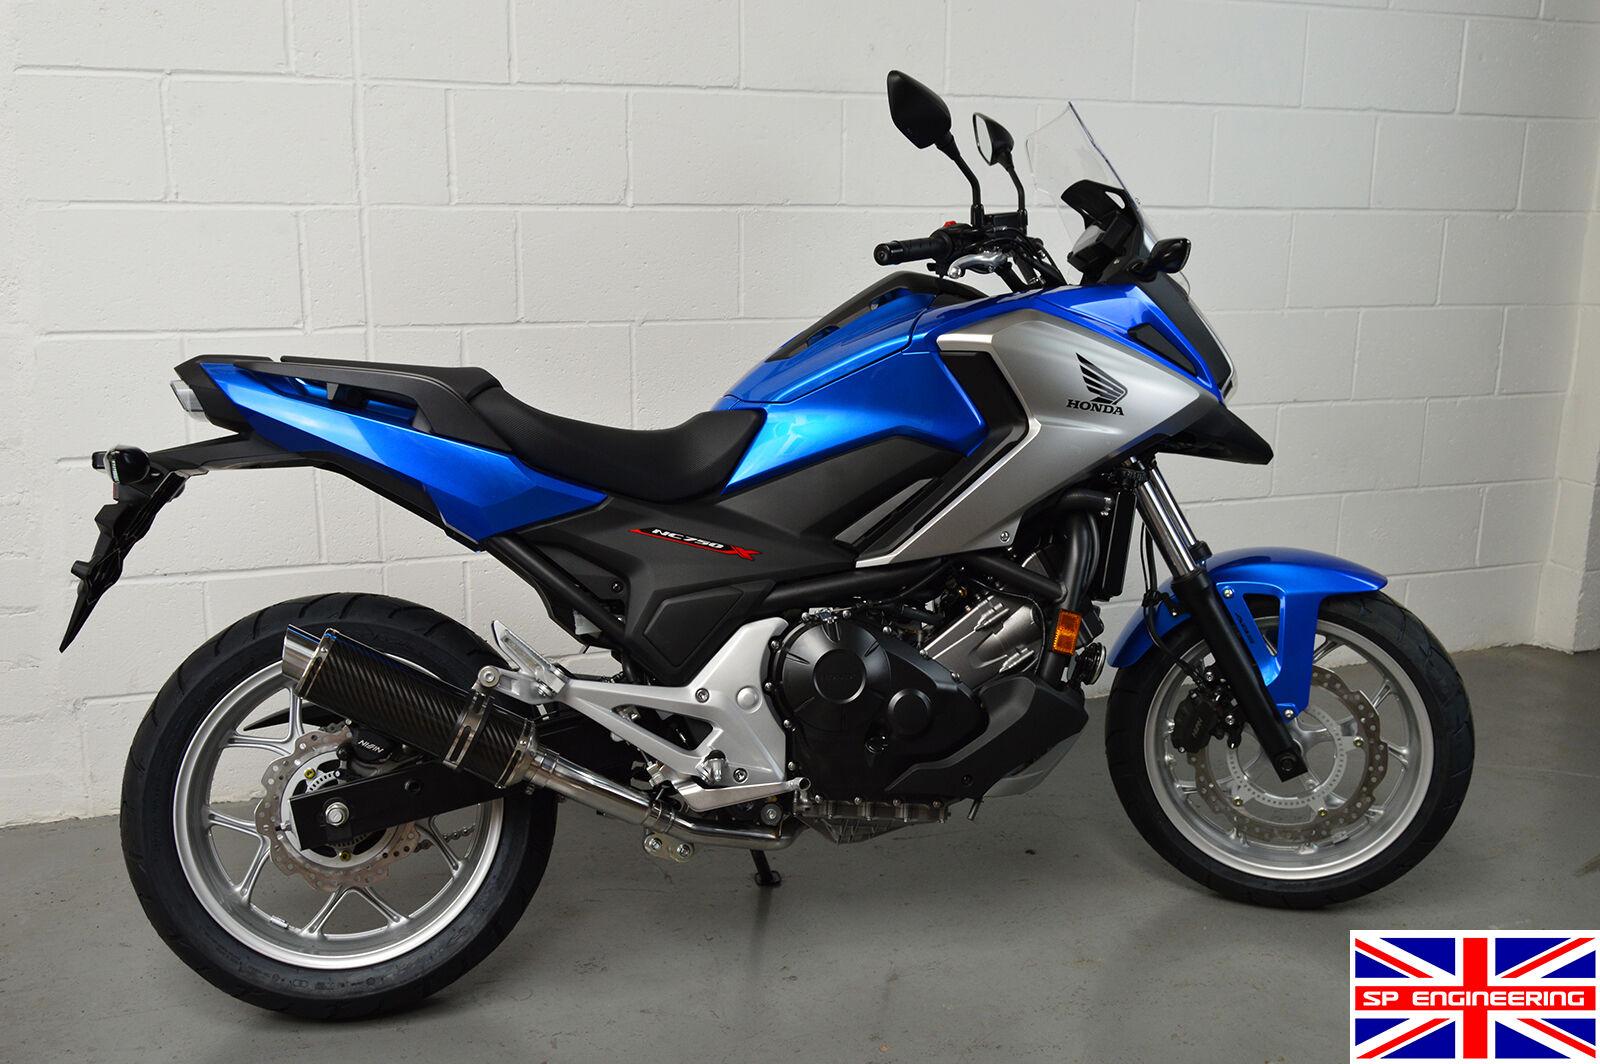 Yamaha FZ8 10-15 SP Engineering Satin Black Round Moto GP XLS Exhaust